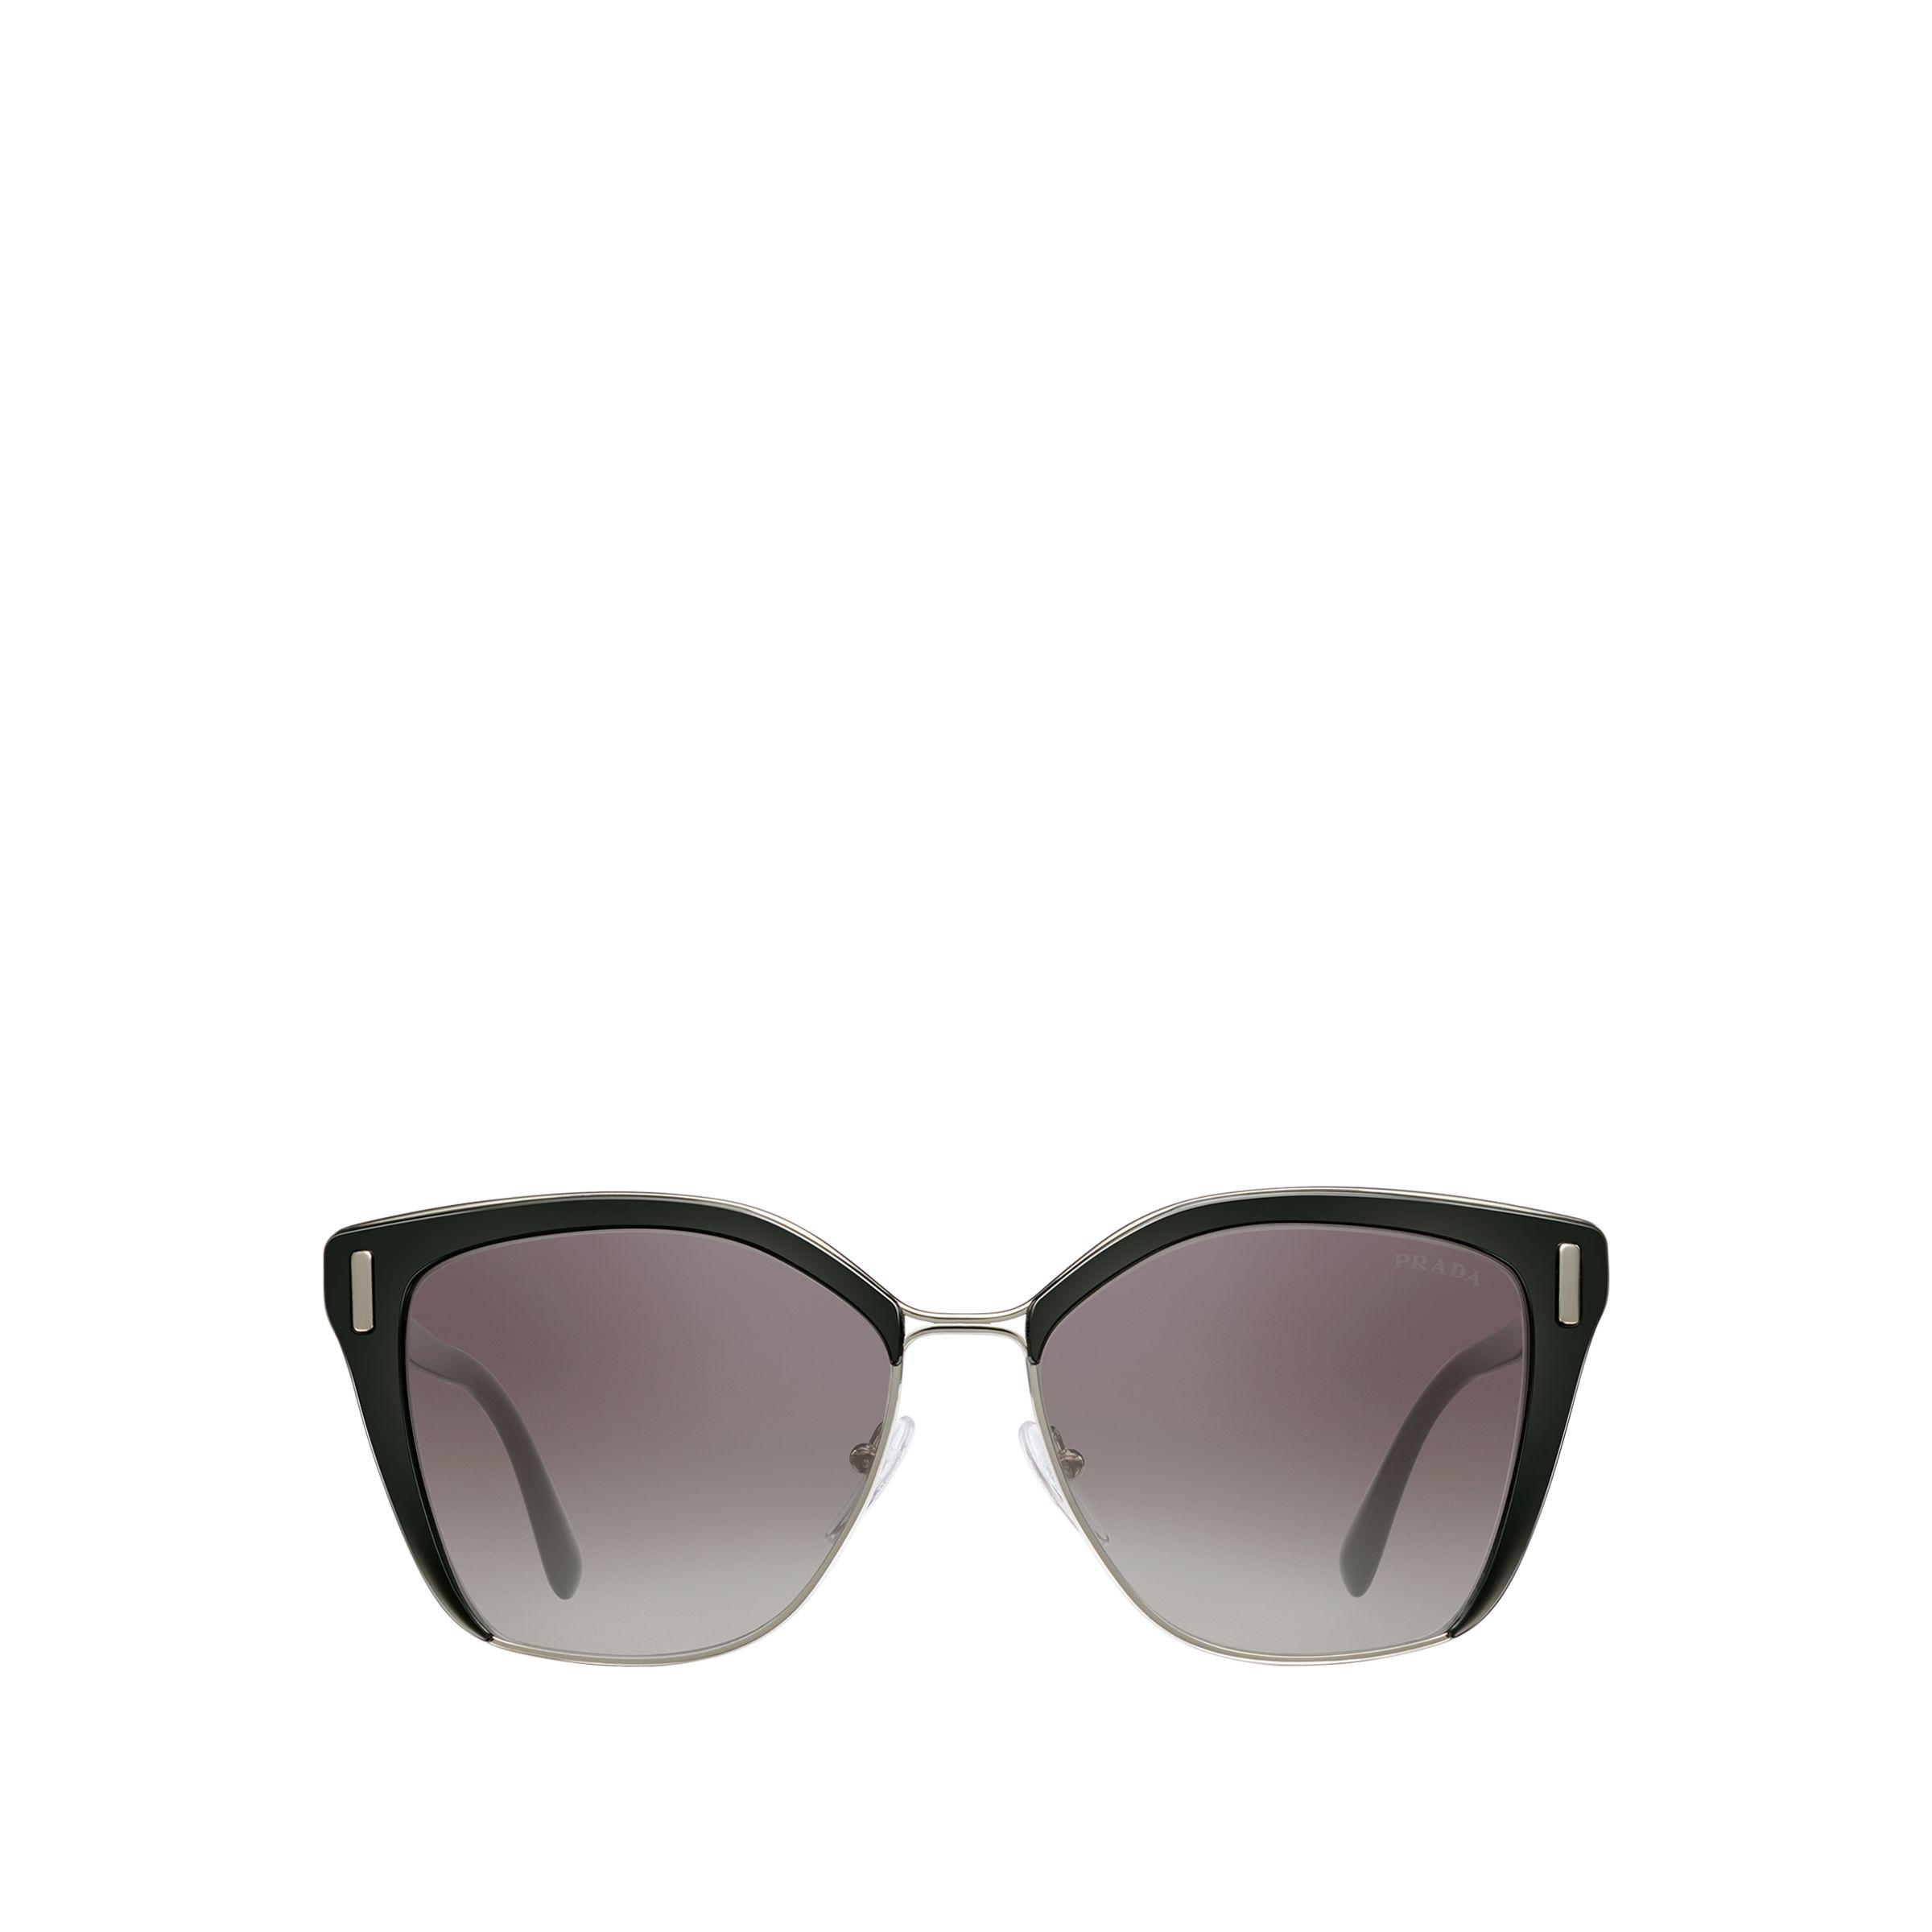 18c0058cb25a4 Prada. Women s Mod Eyewear.  400 From Orchard Mile